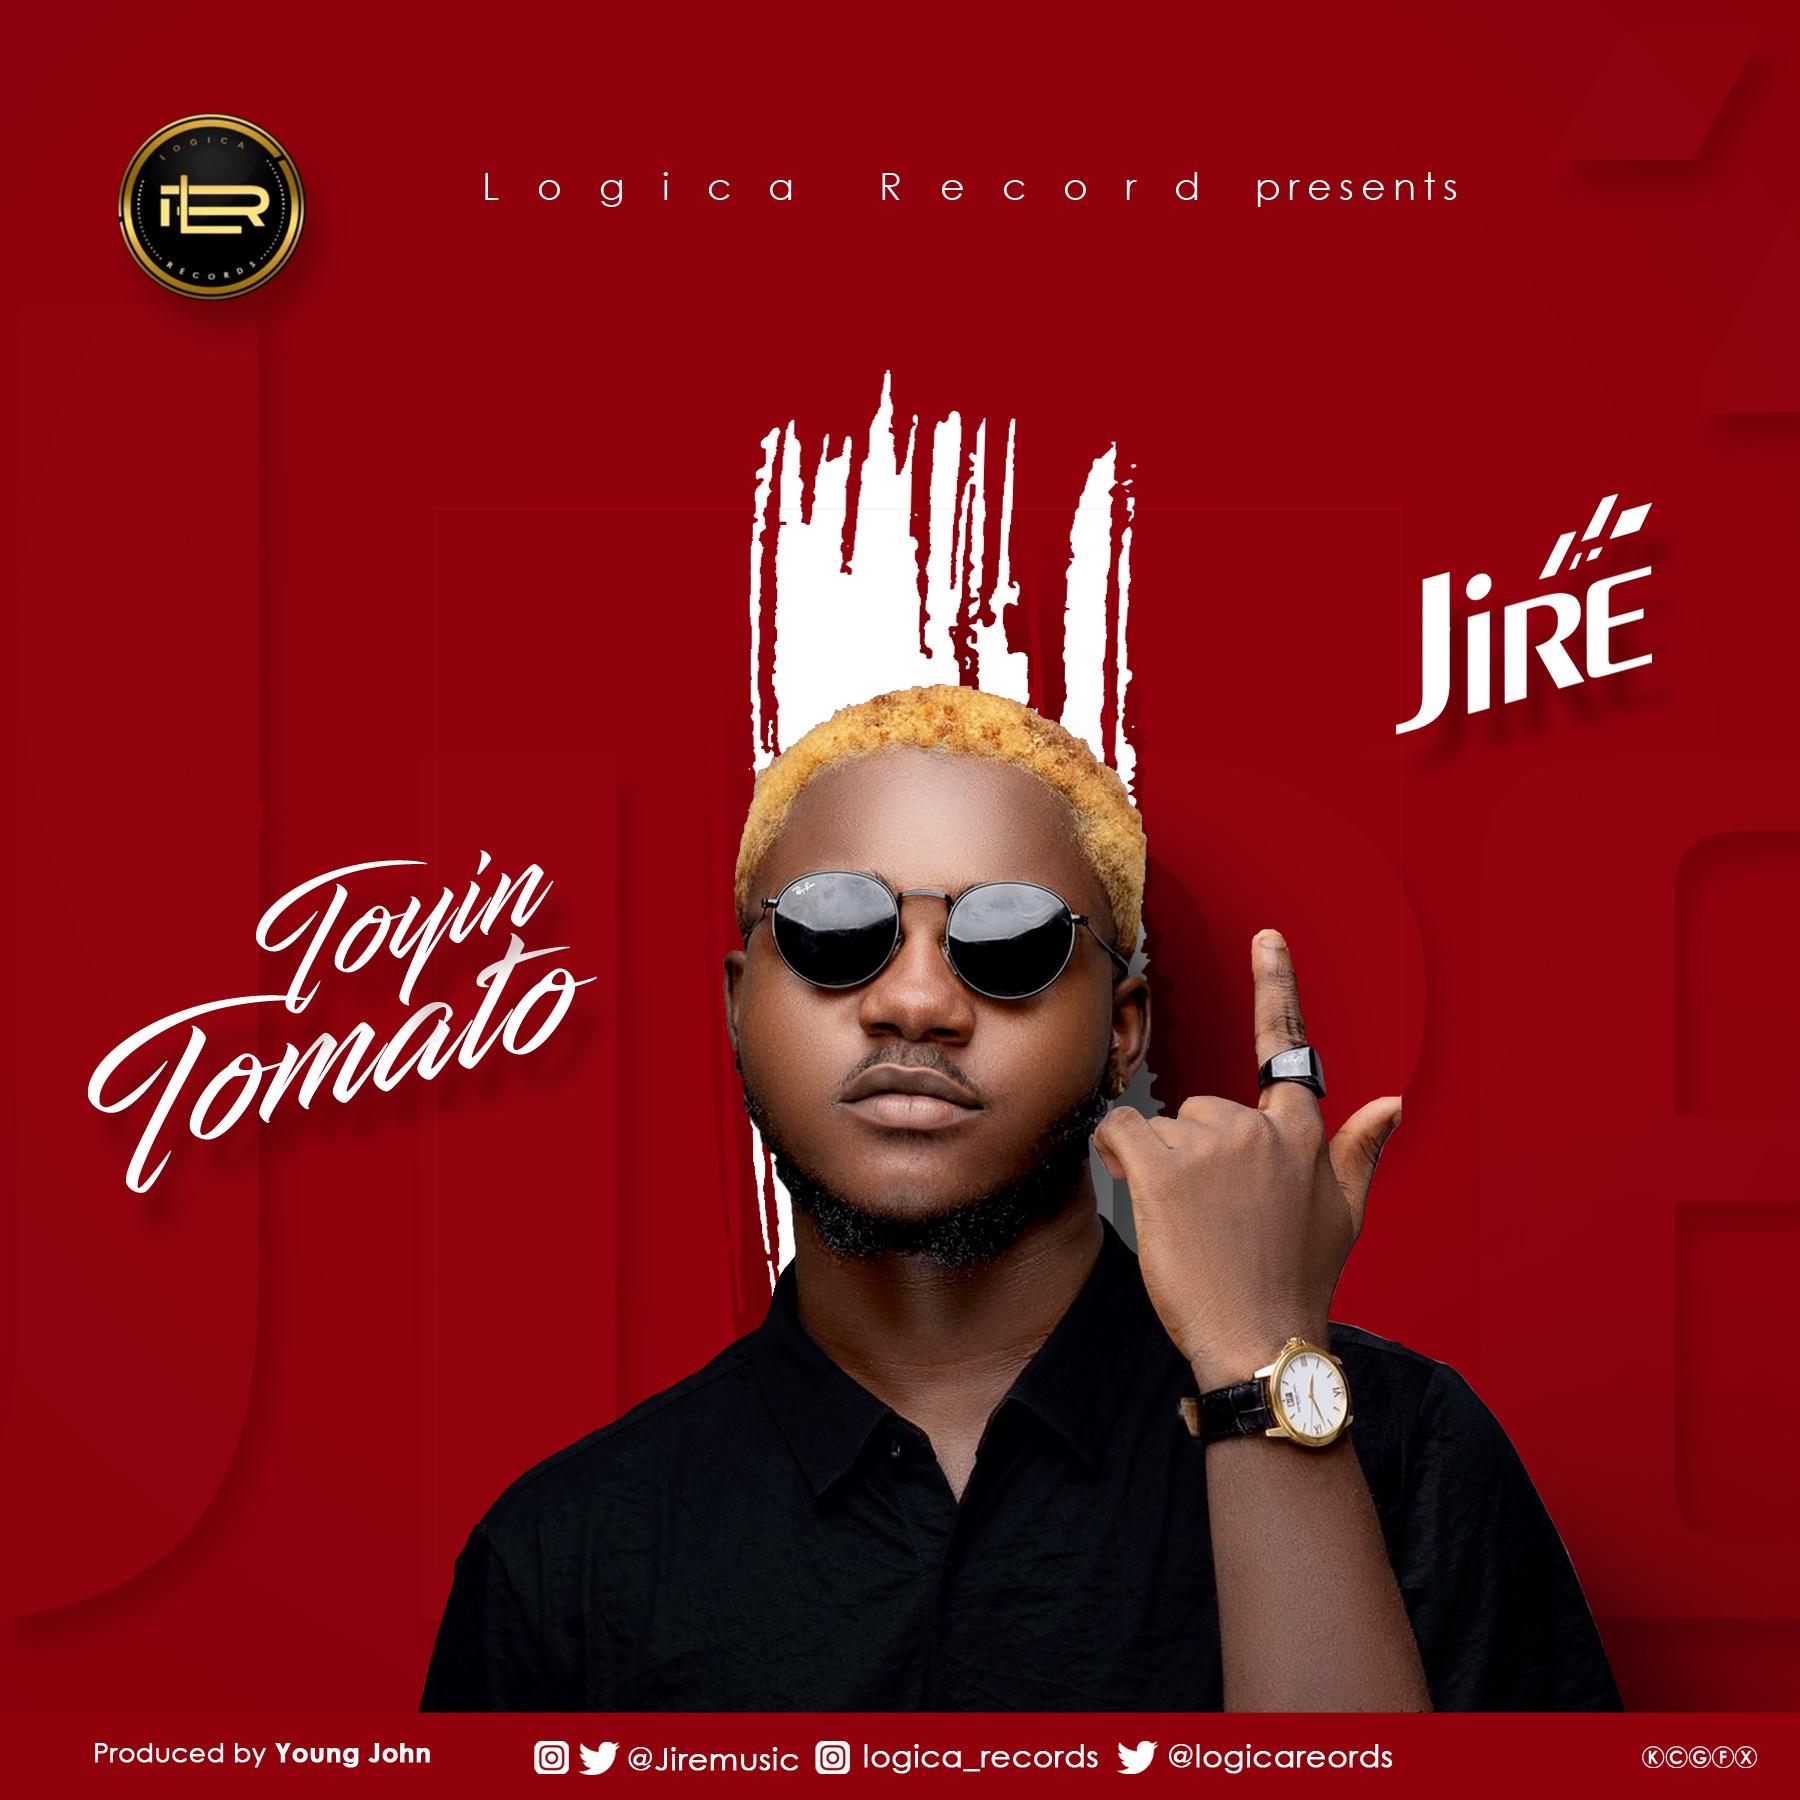 Jire – Toyin Tomato (Prod. by Young John)